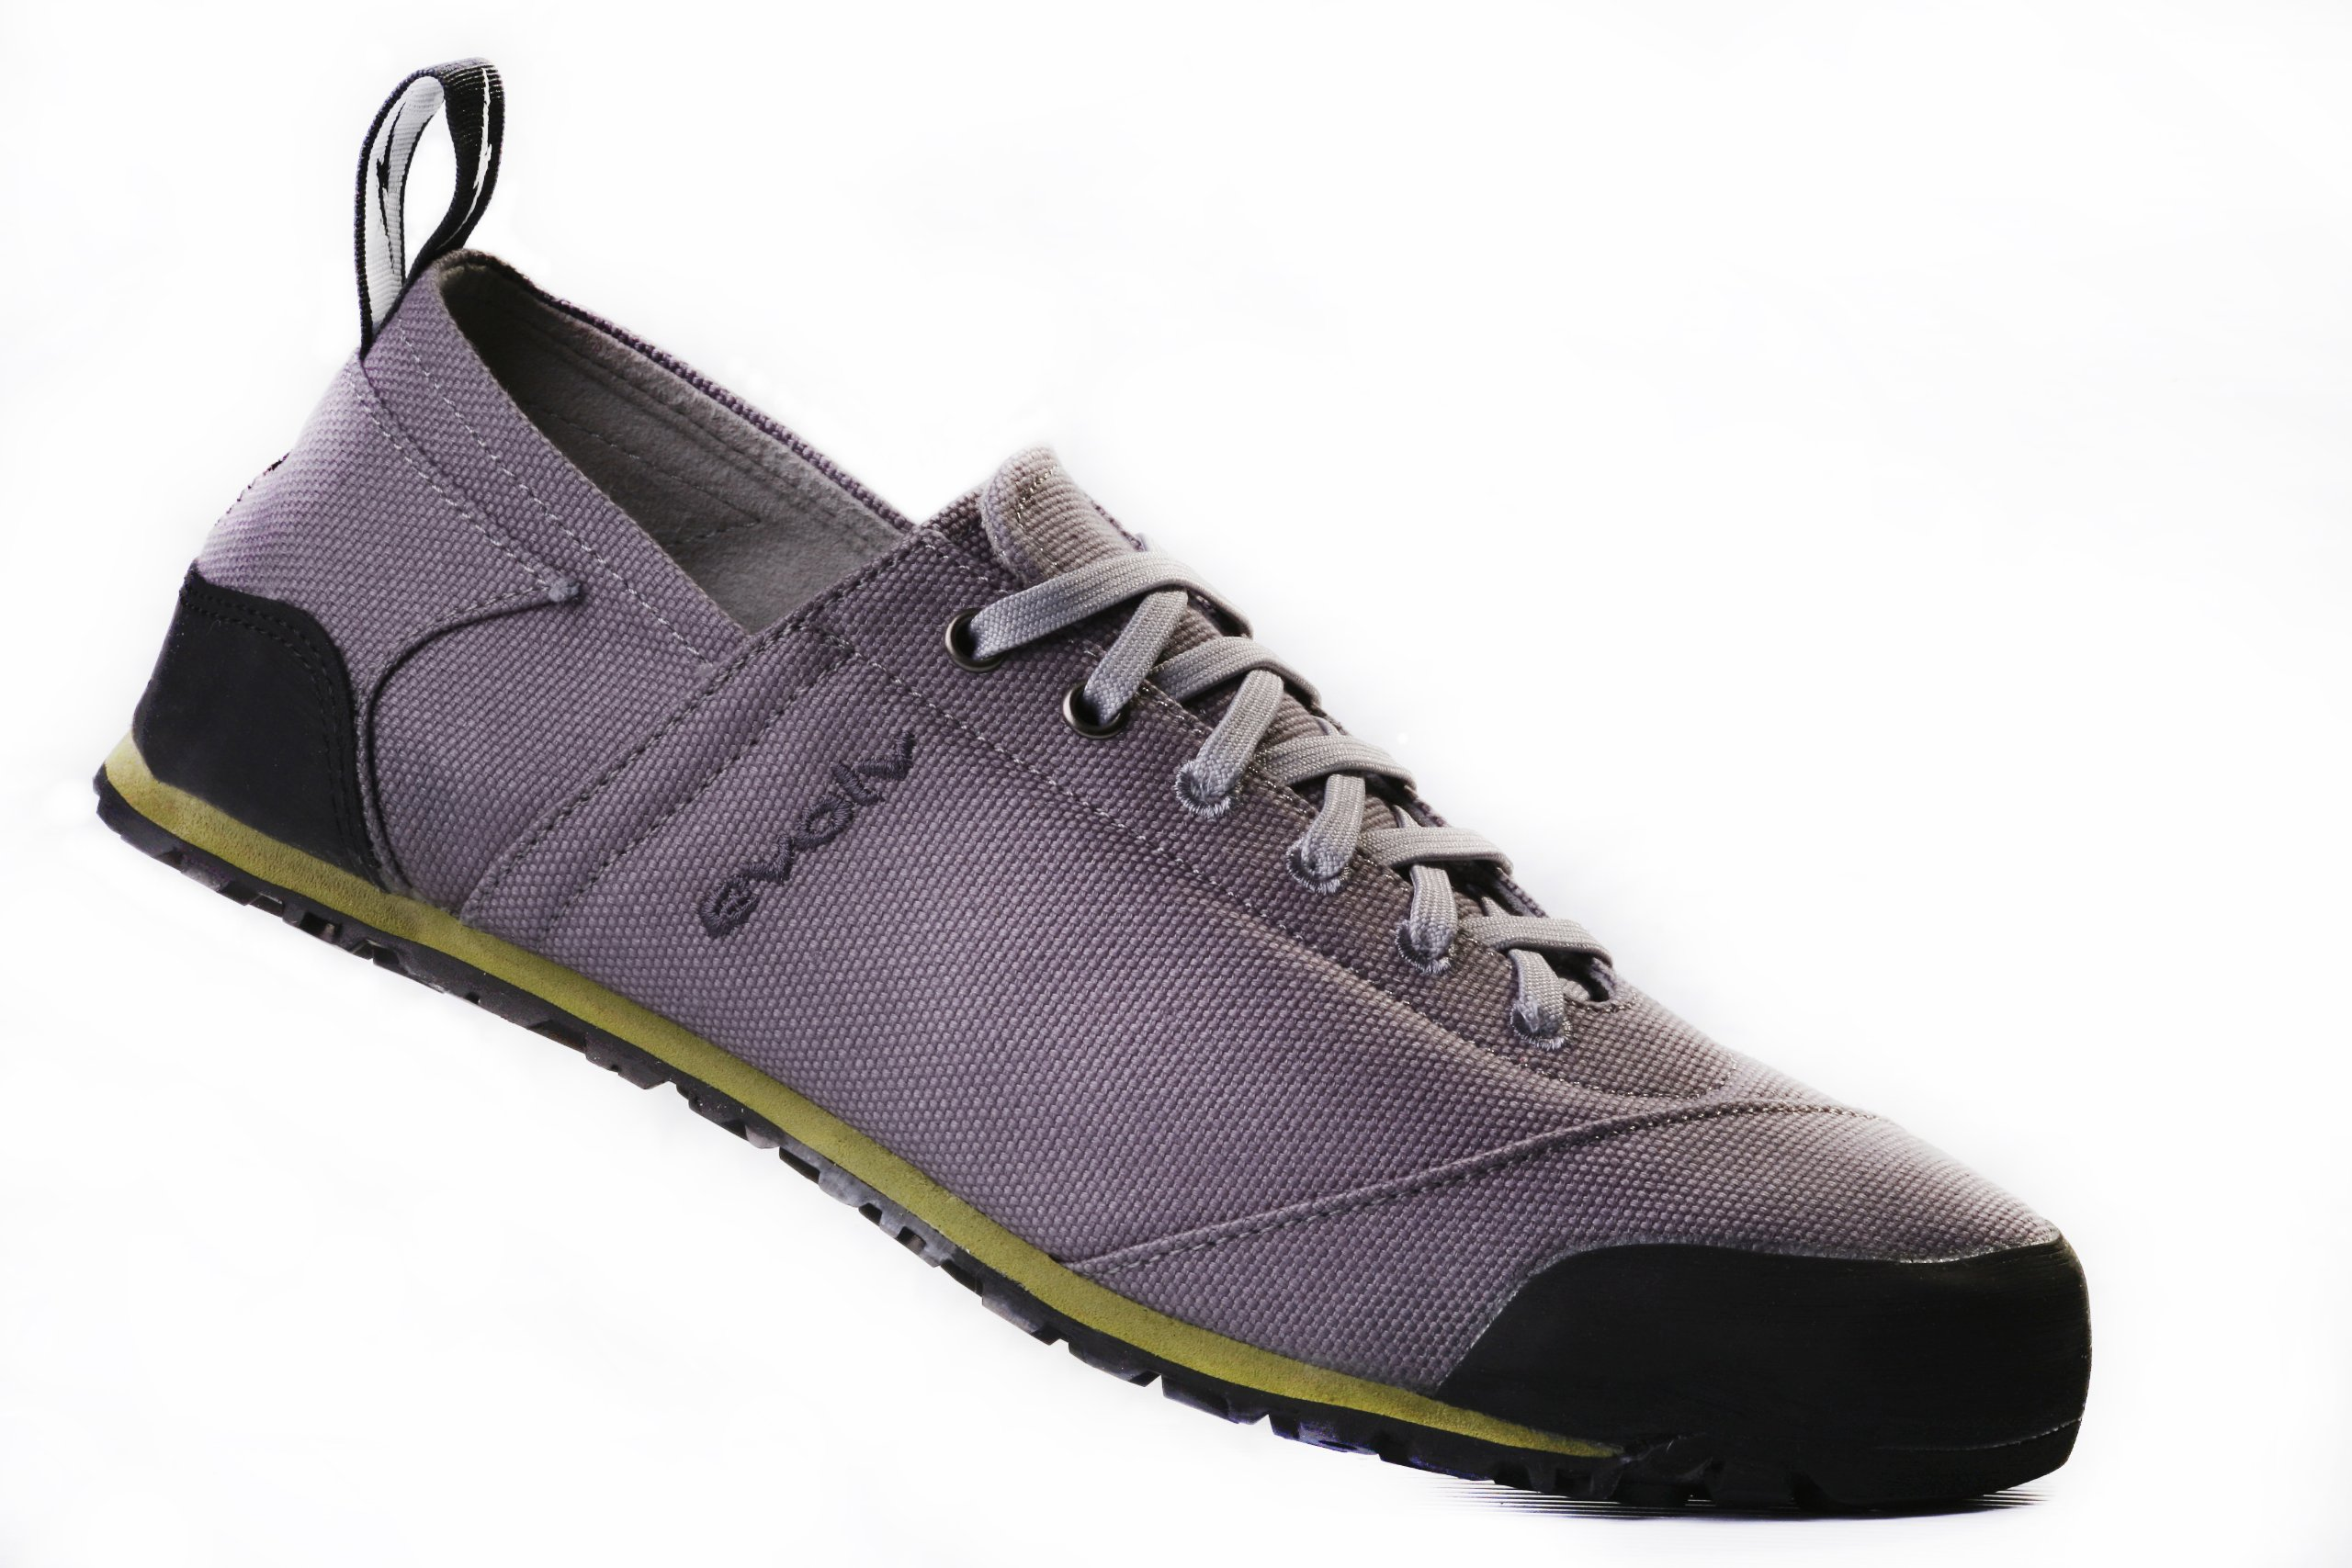 Evolv Men's Cruzer Approach Shoe,Slate,5 M US by Evolv